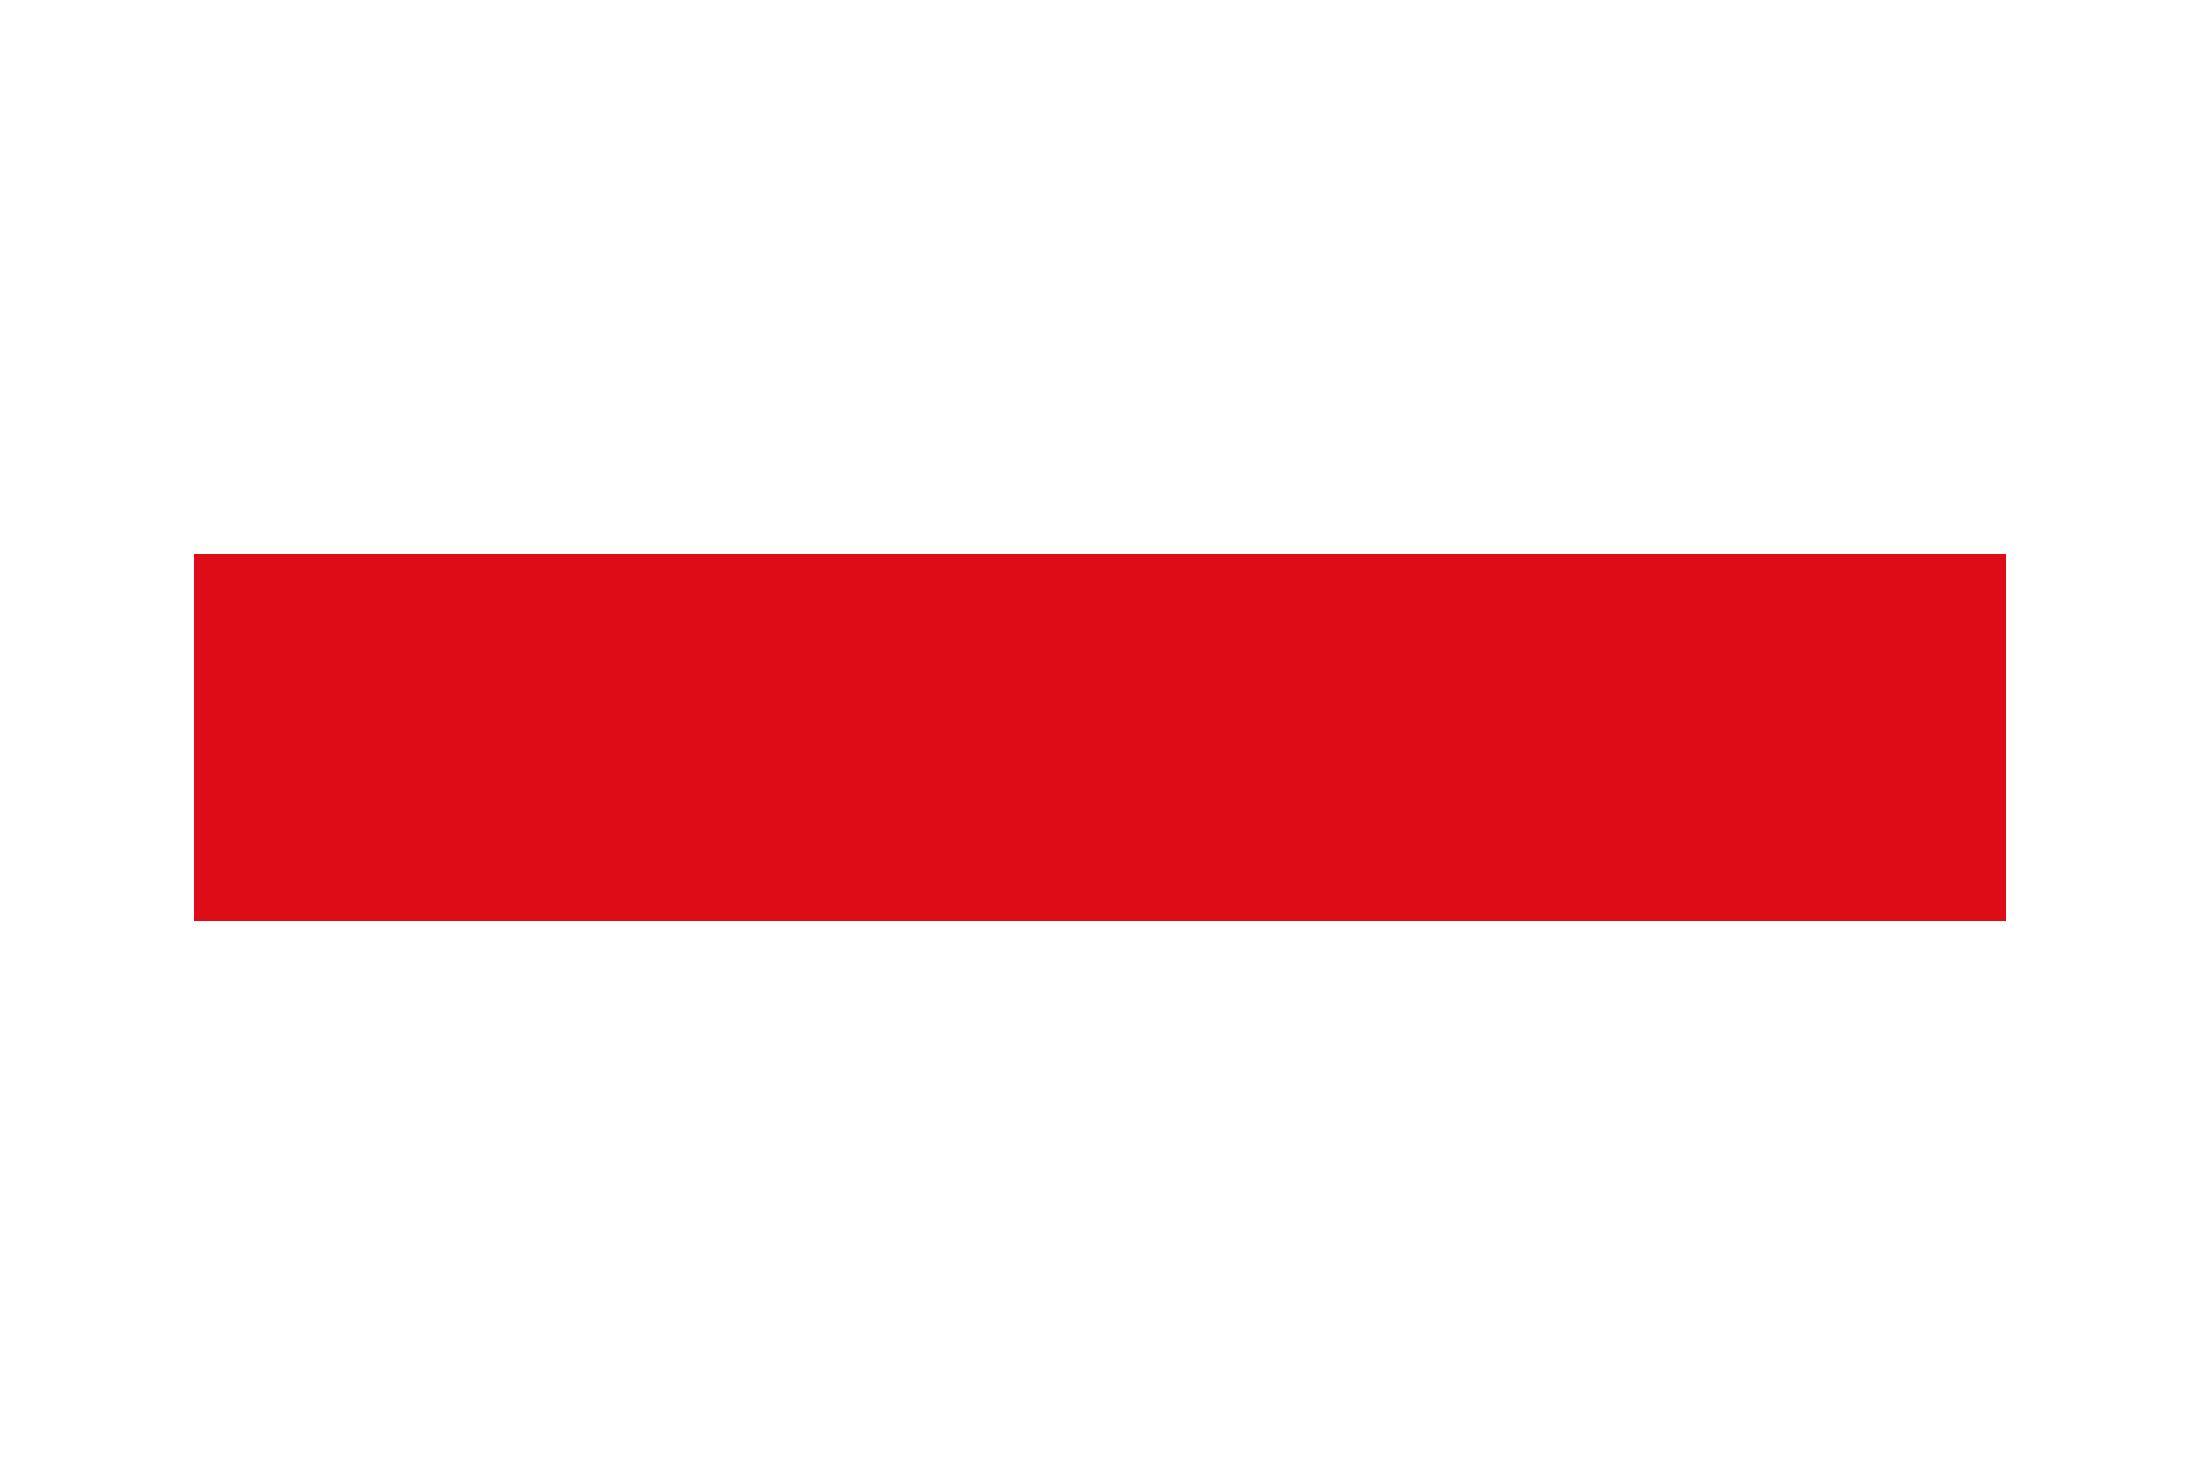 Grunge premium quality label PSD